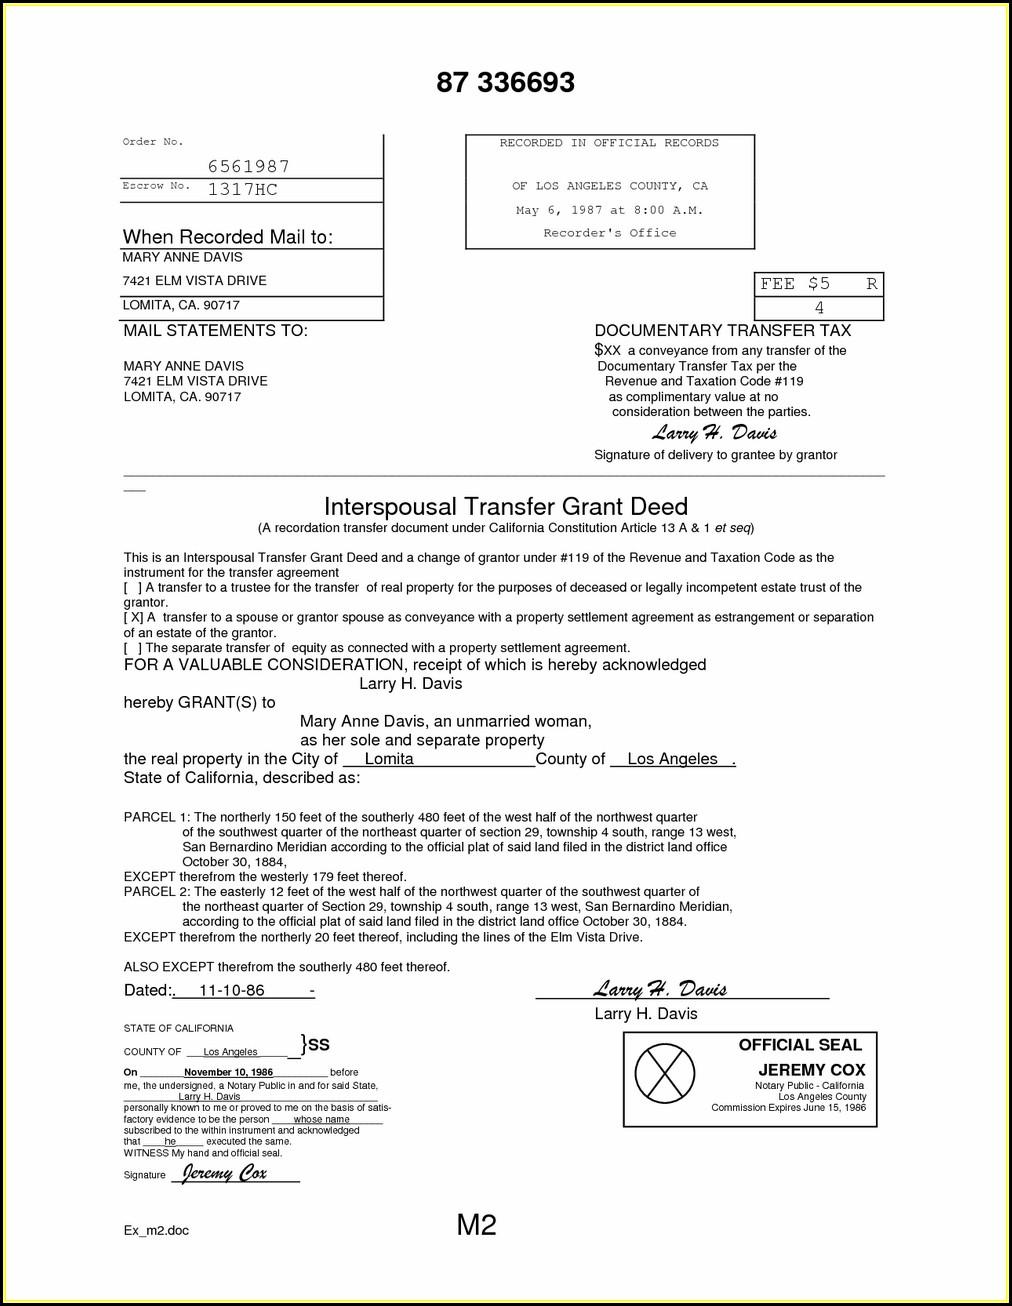 Interspousal Grant Deed Form California